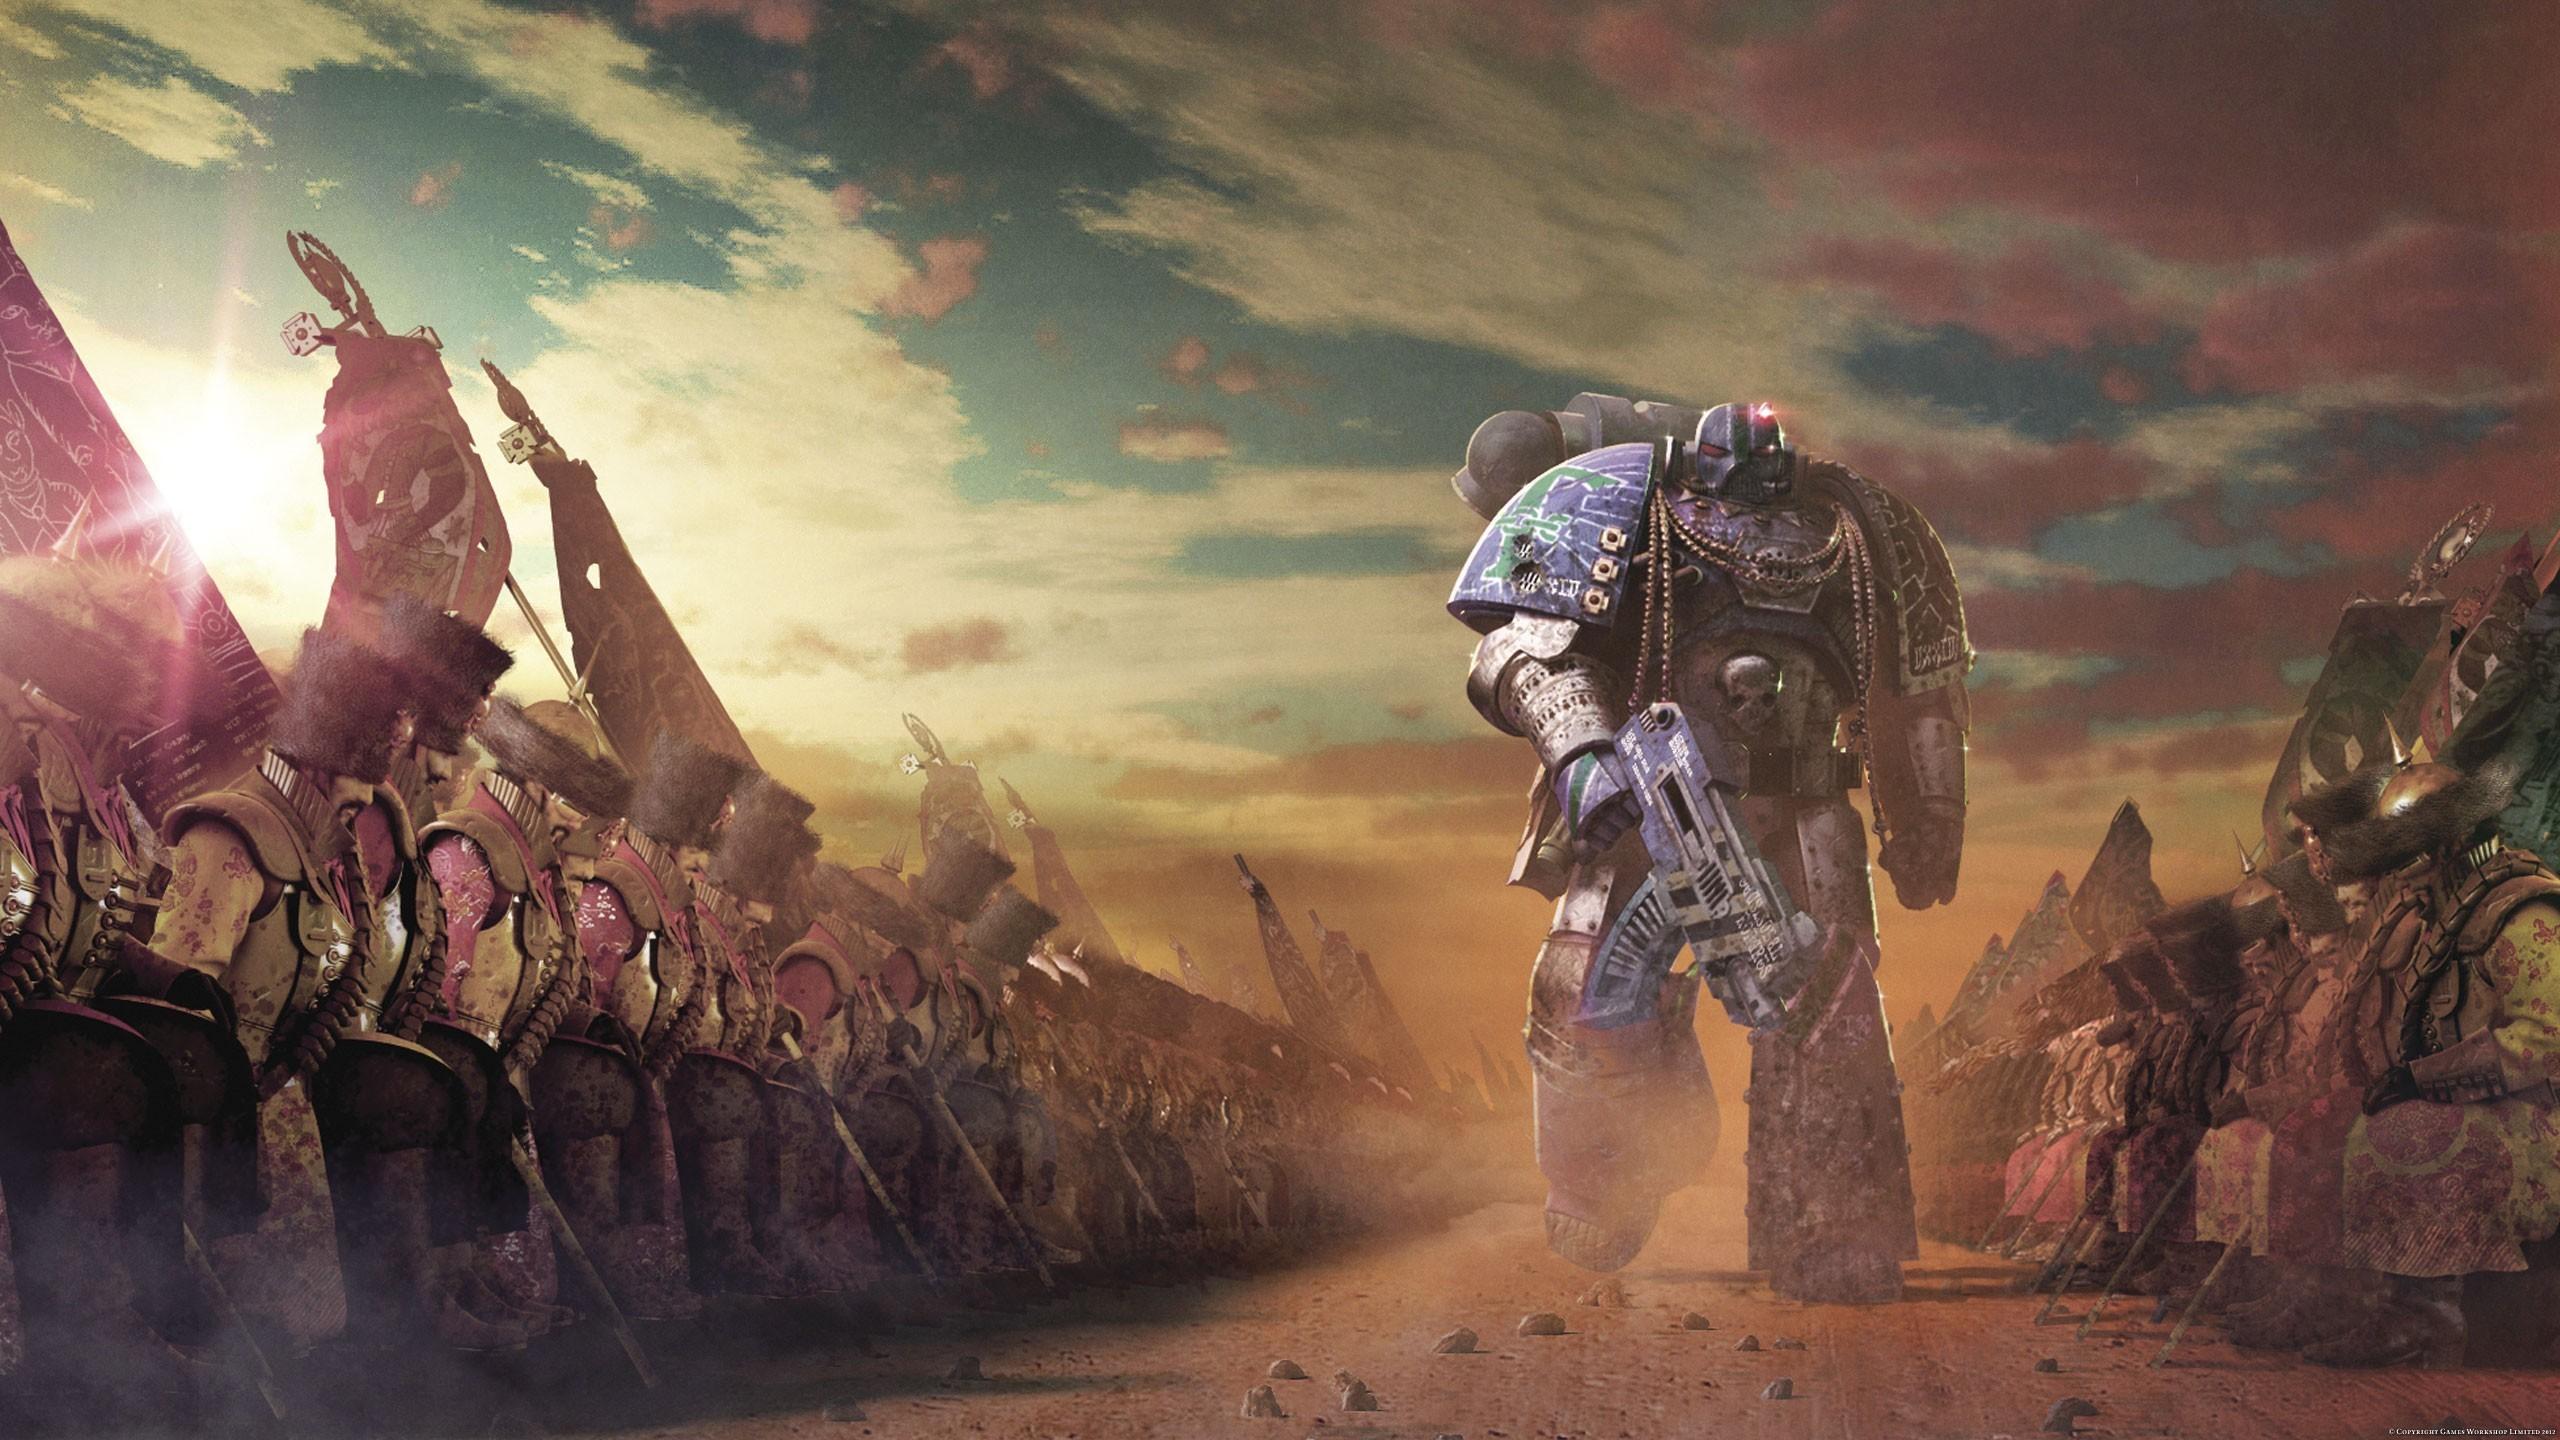 Res: 2560x1440, Horus heresy legion science fiction space marines wallpaper